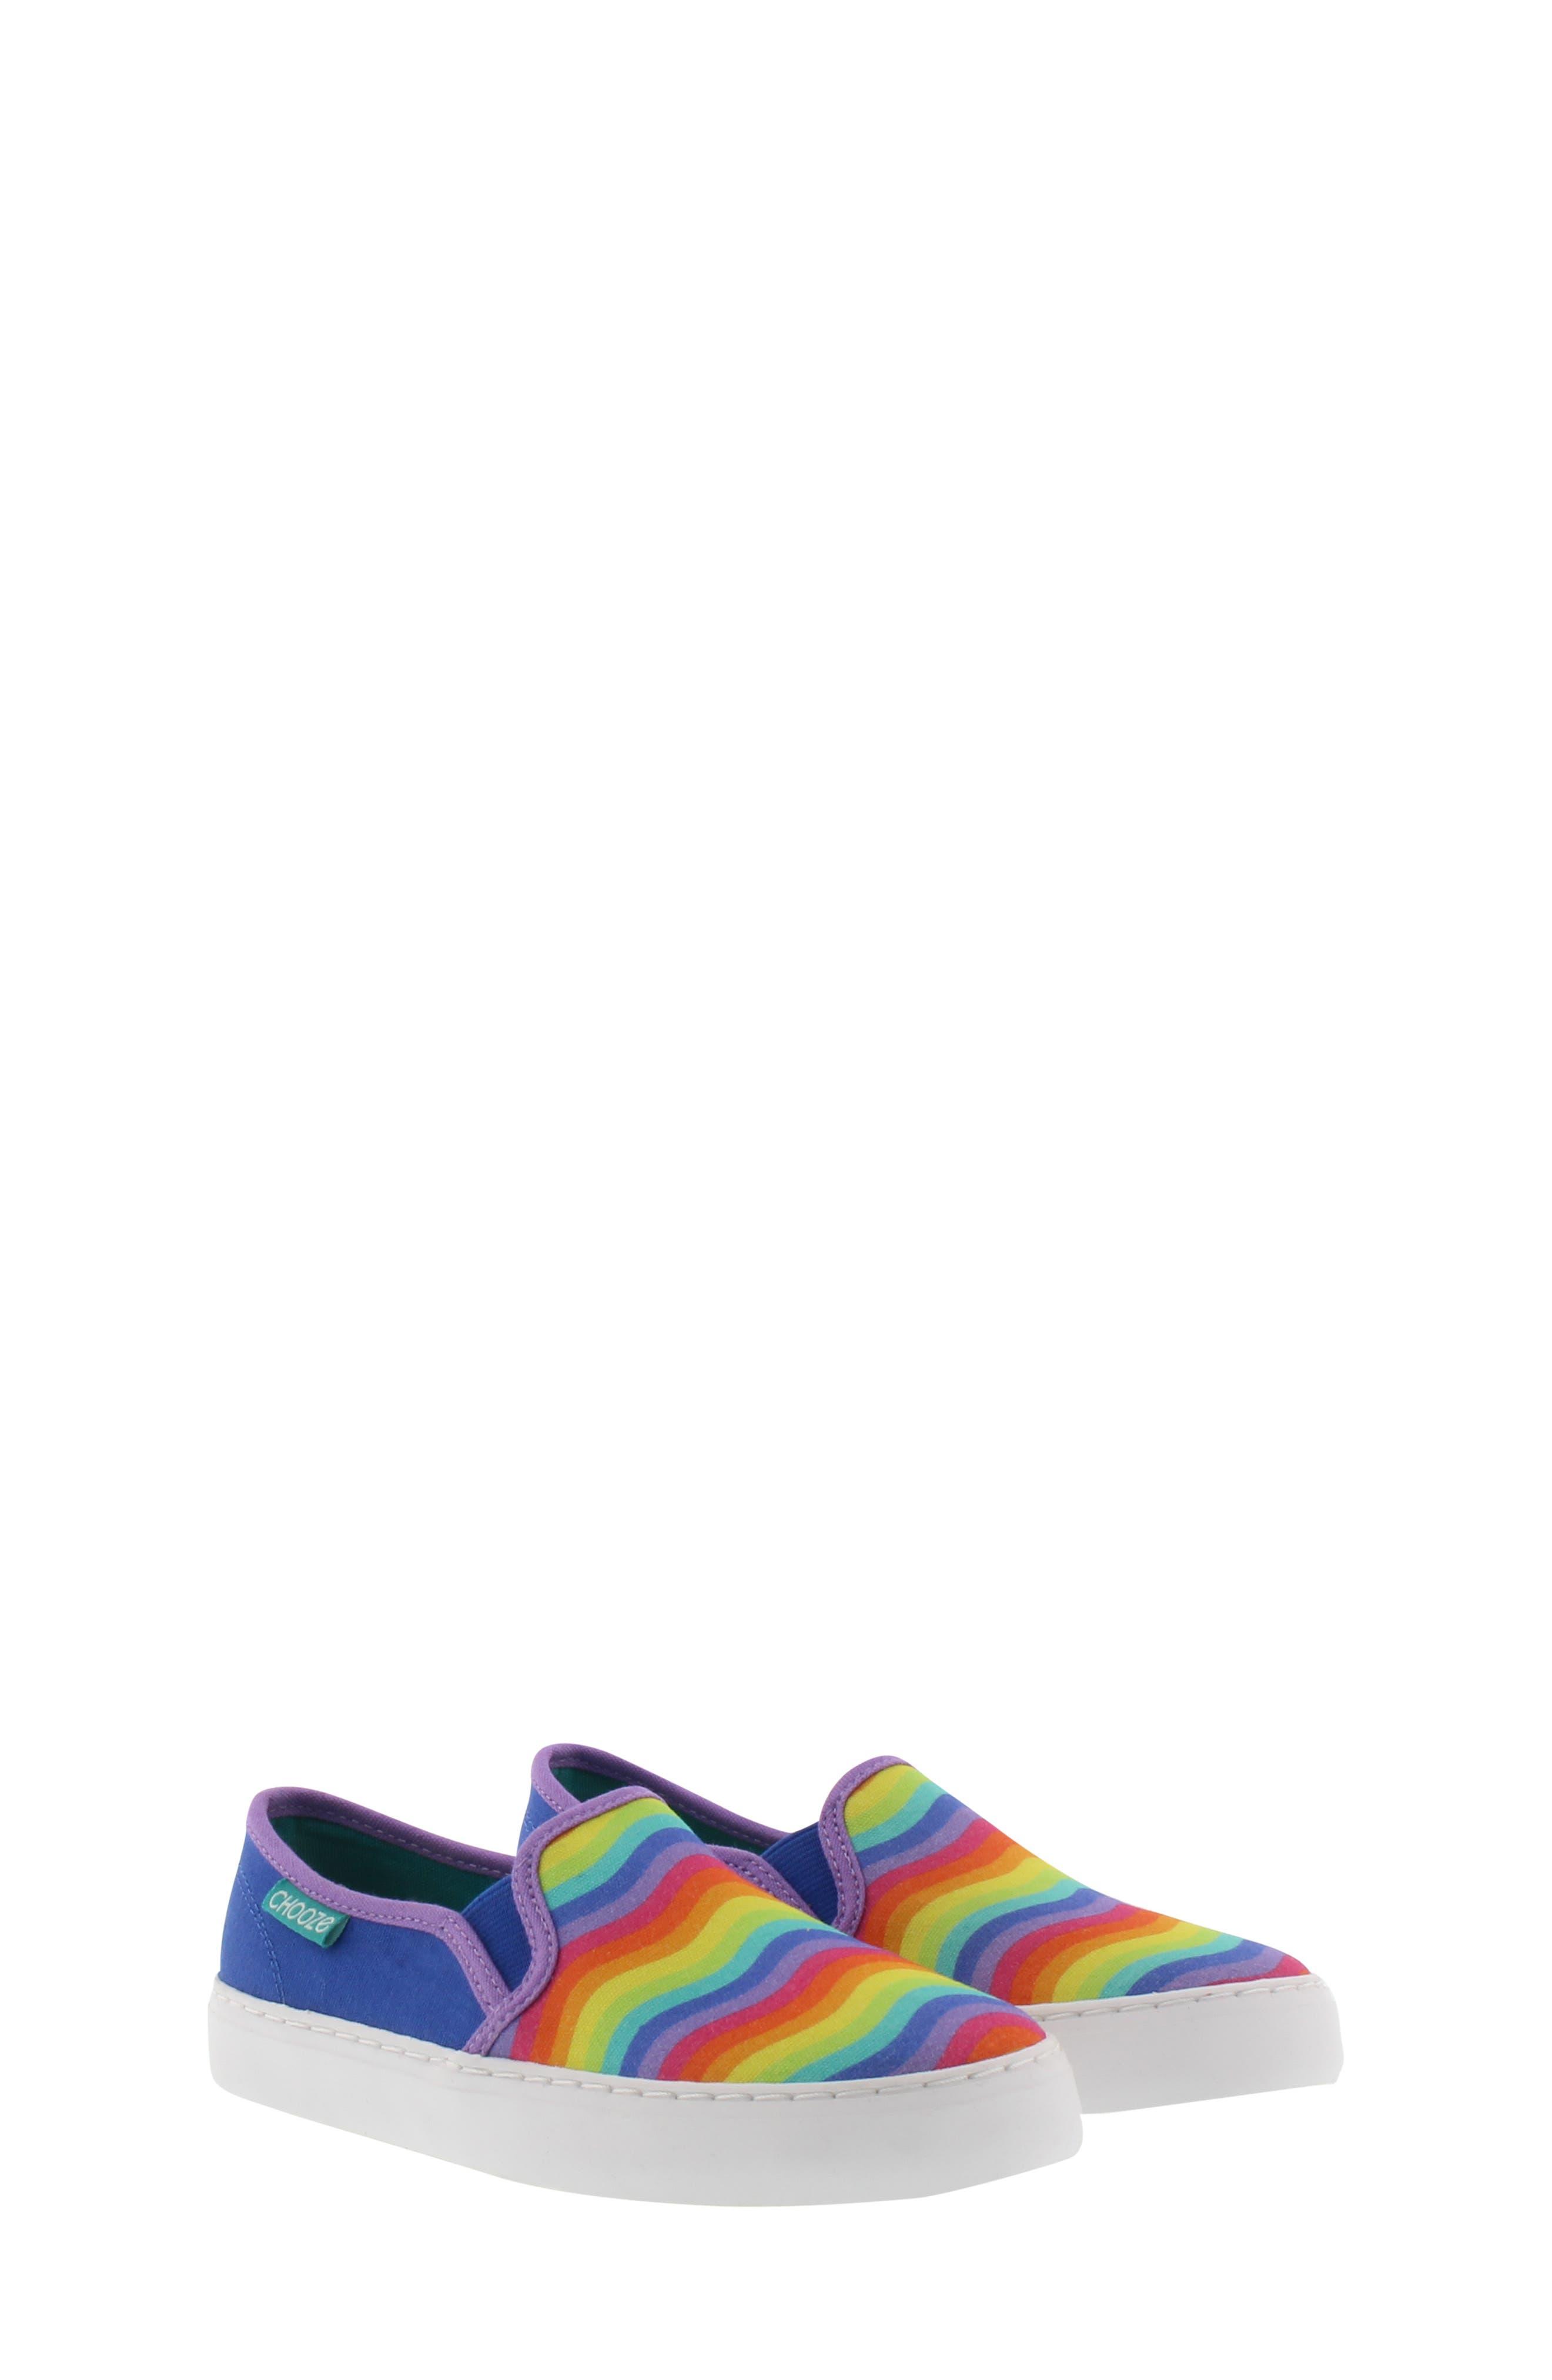 CHOOZE, Motion Slip-On Sneaker, Main thumbnail 1, color, BLUE MULTI